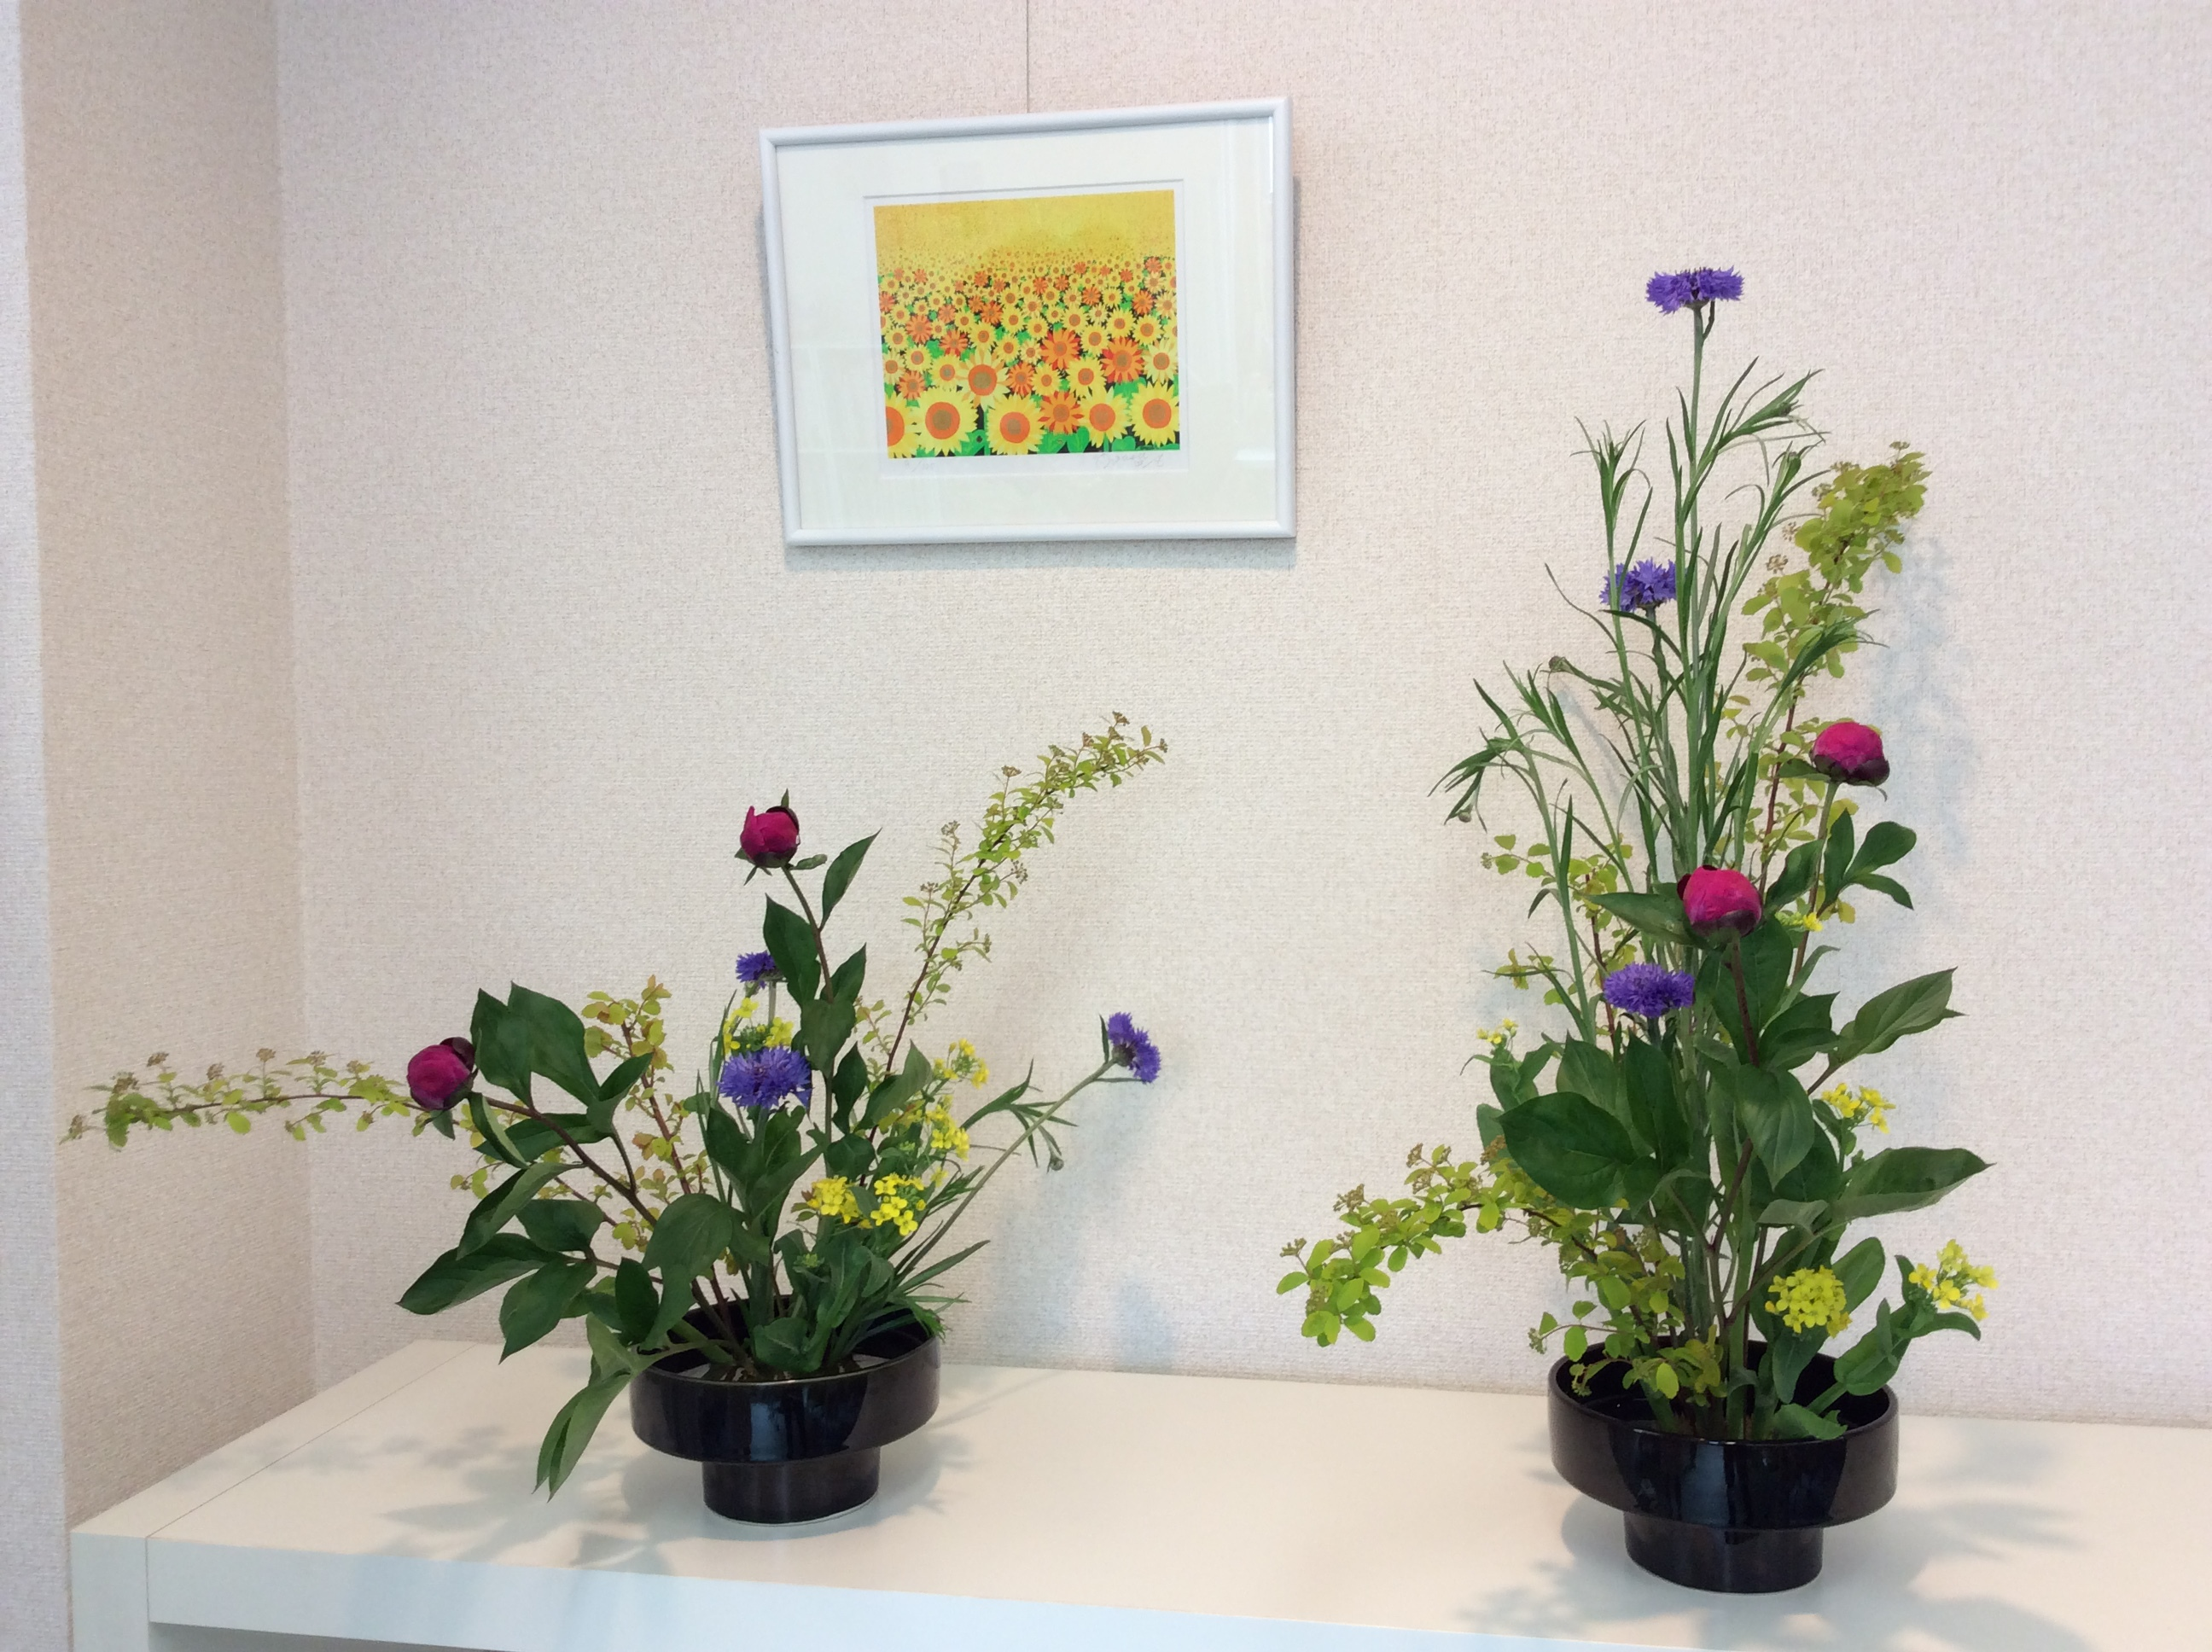 芍薬と矢車菊